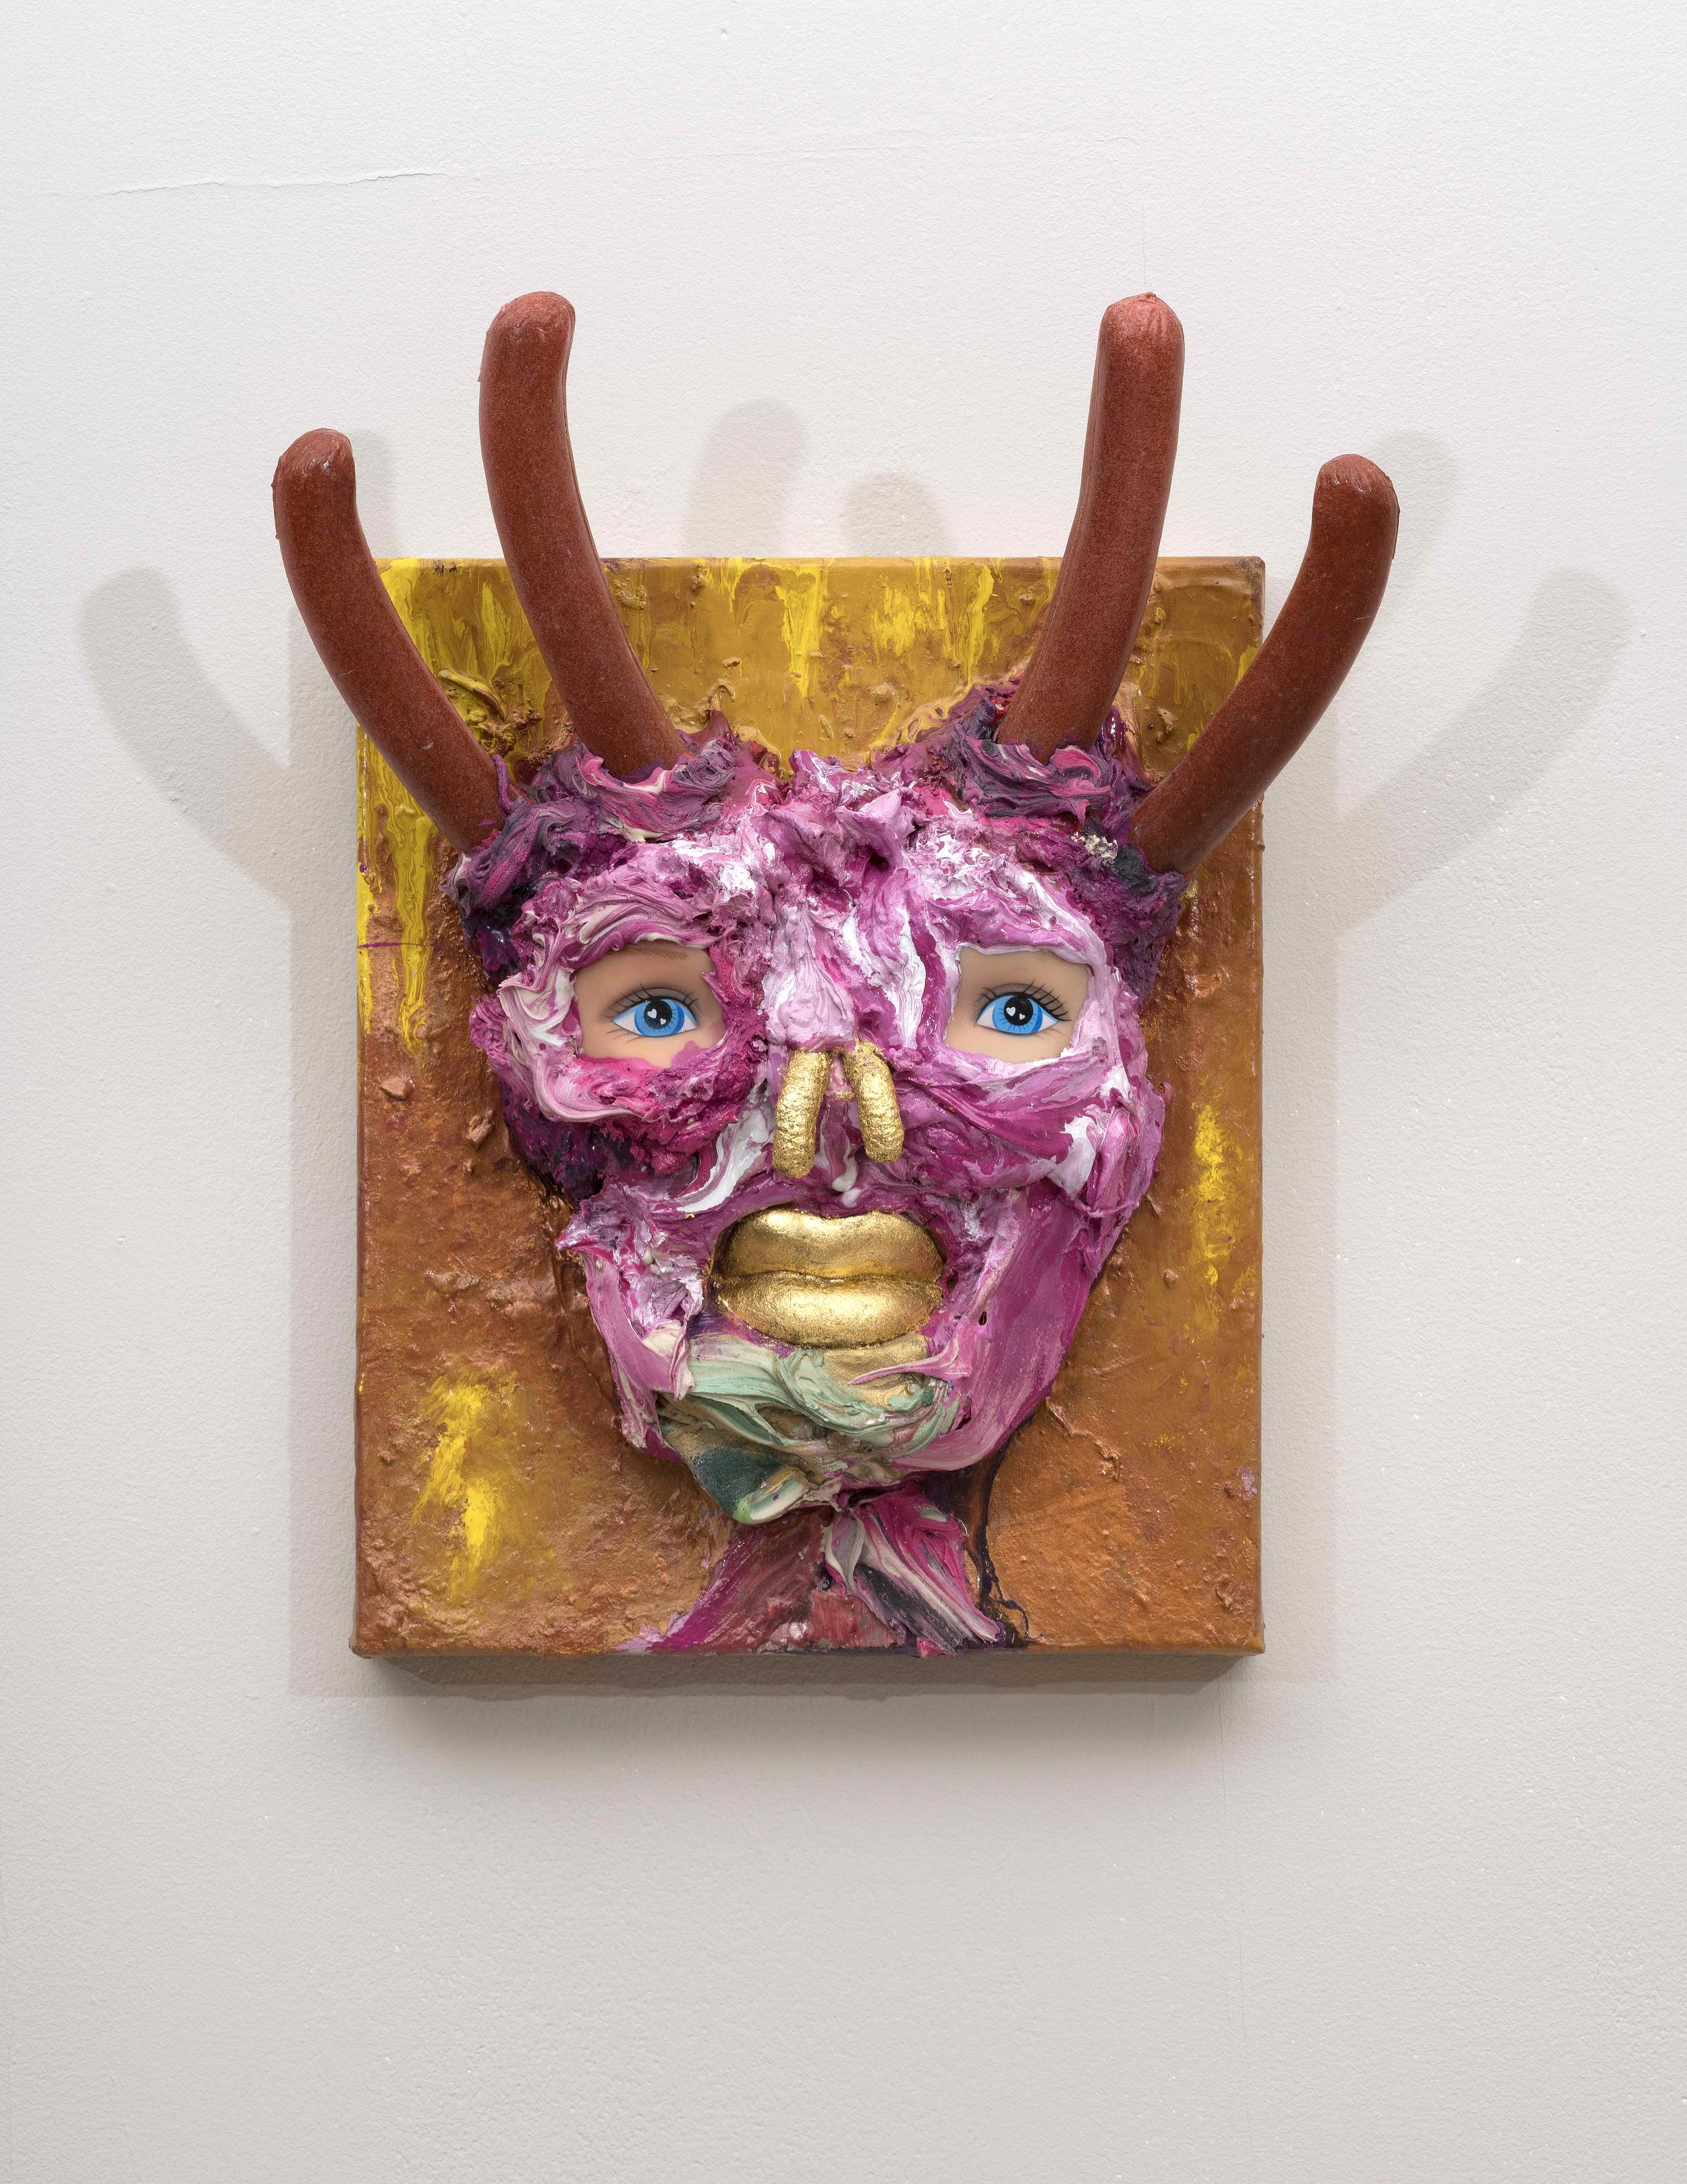 Frankfurter Princess, 36 x 30 x 14.5 cm, 2019.